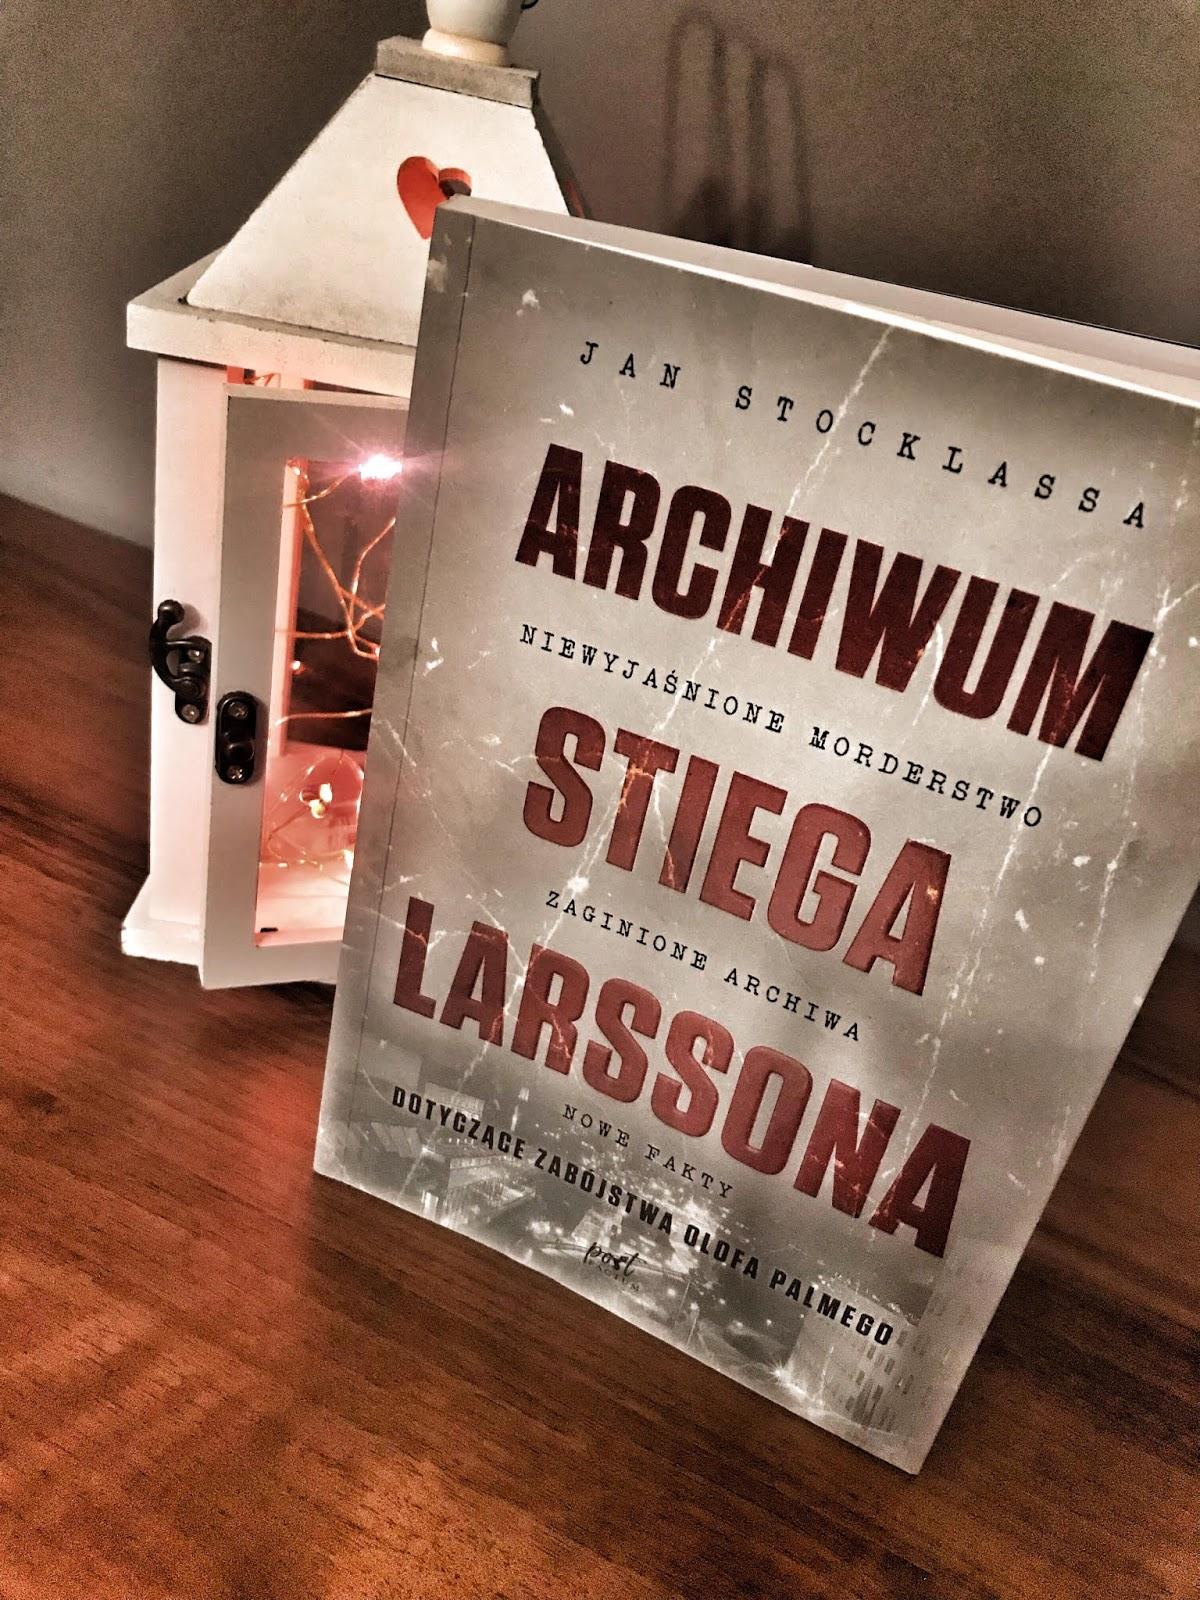 Jan Stocklassa - Archiwum Stiega Larssona